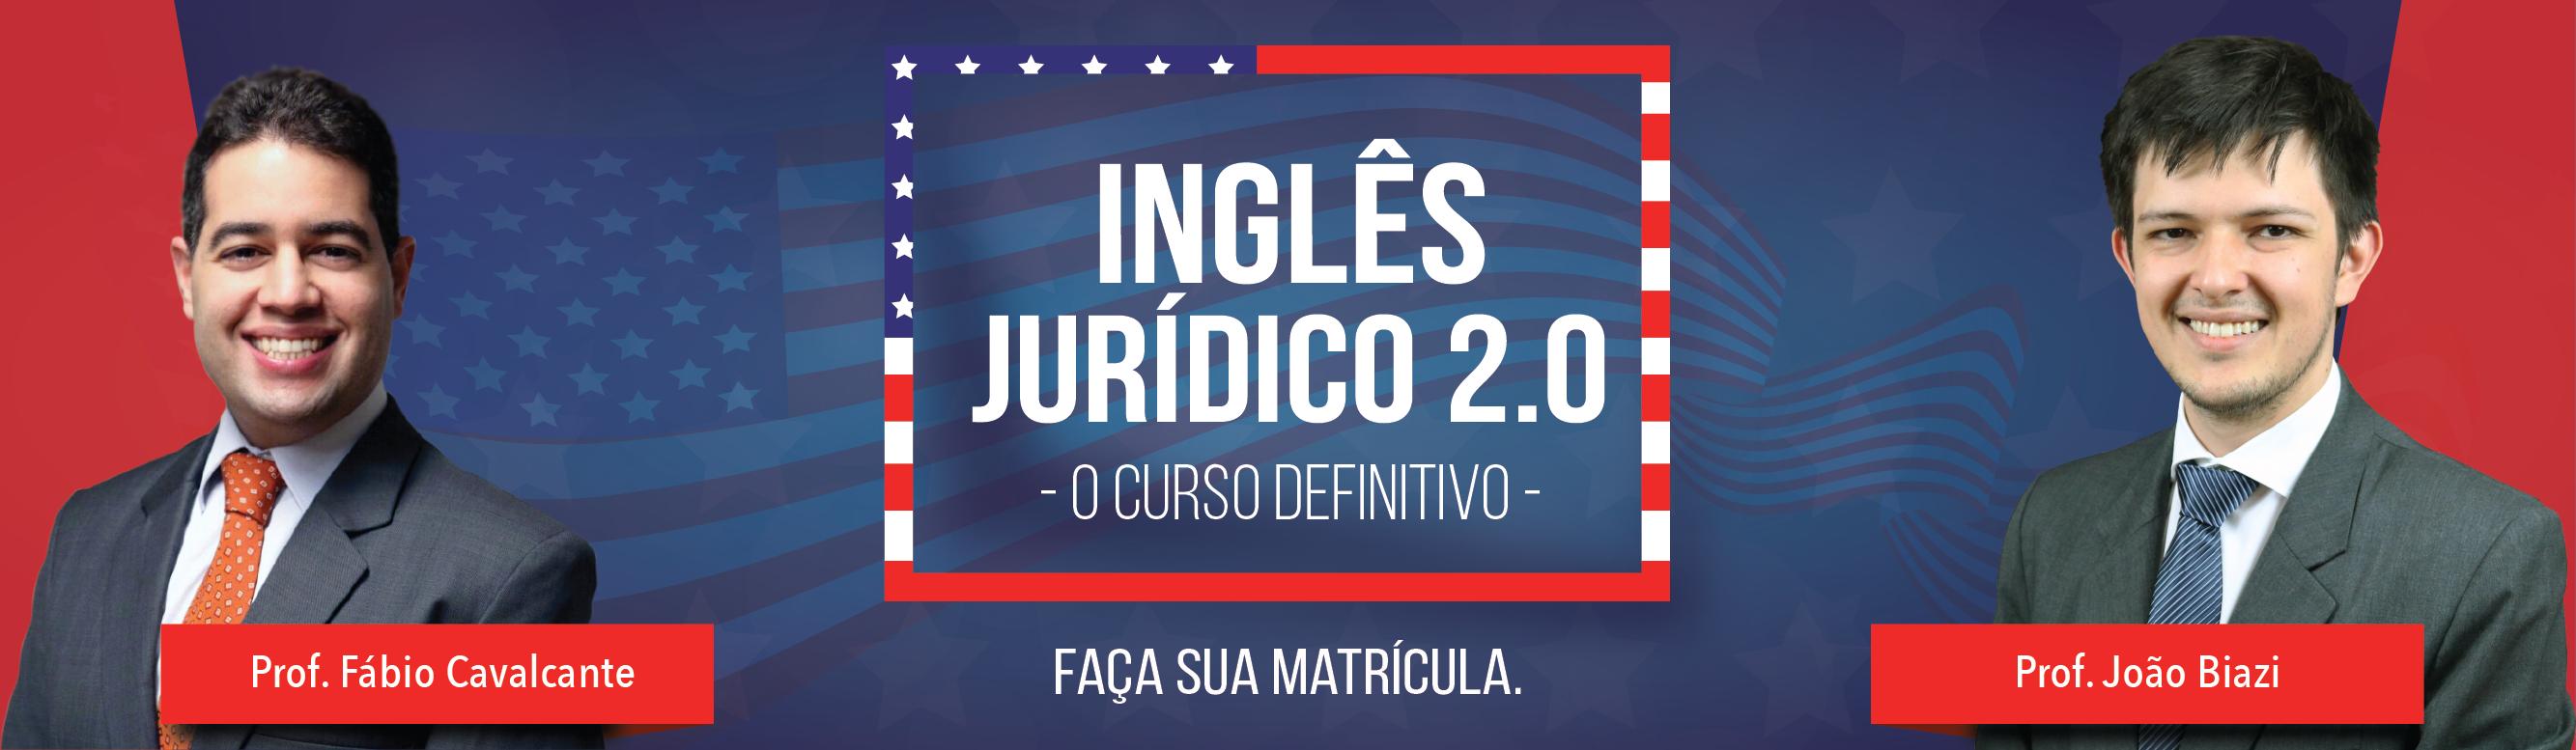 Banner inglesjuridico 01